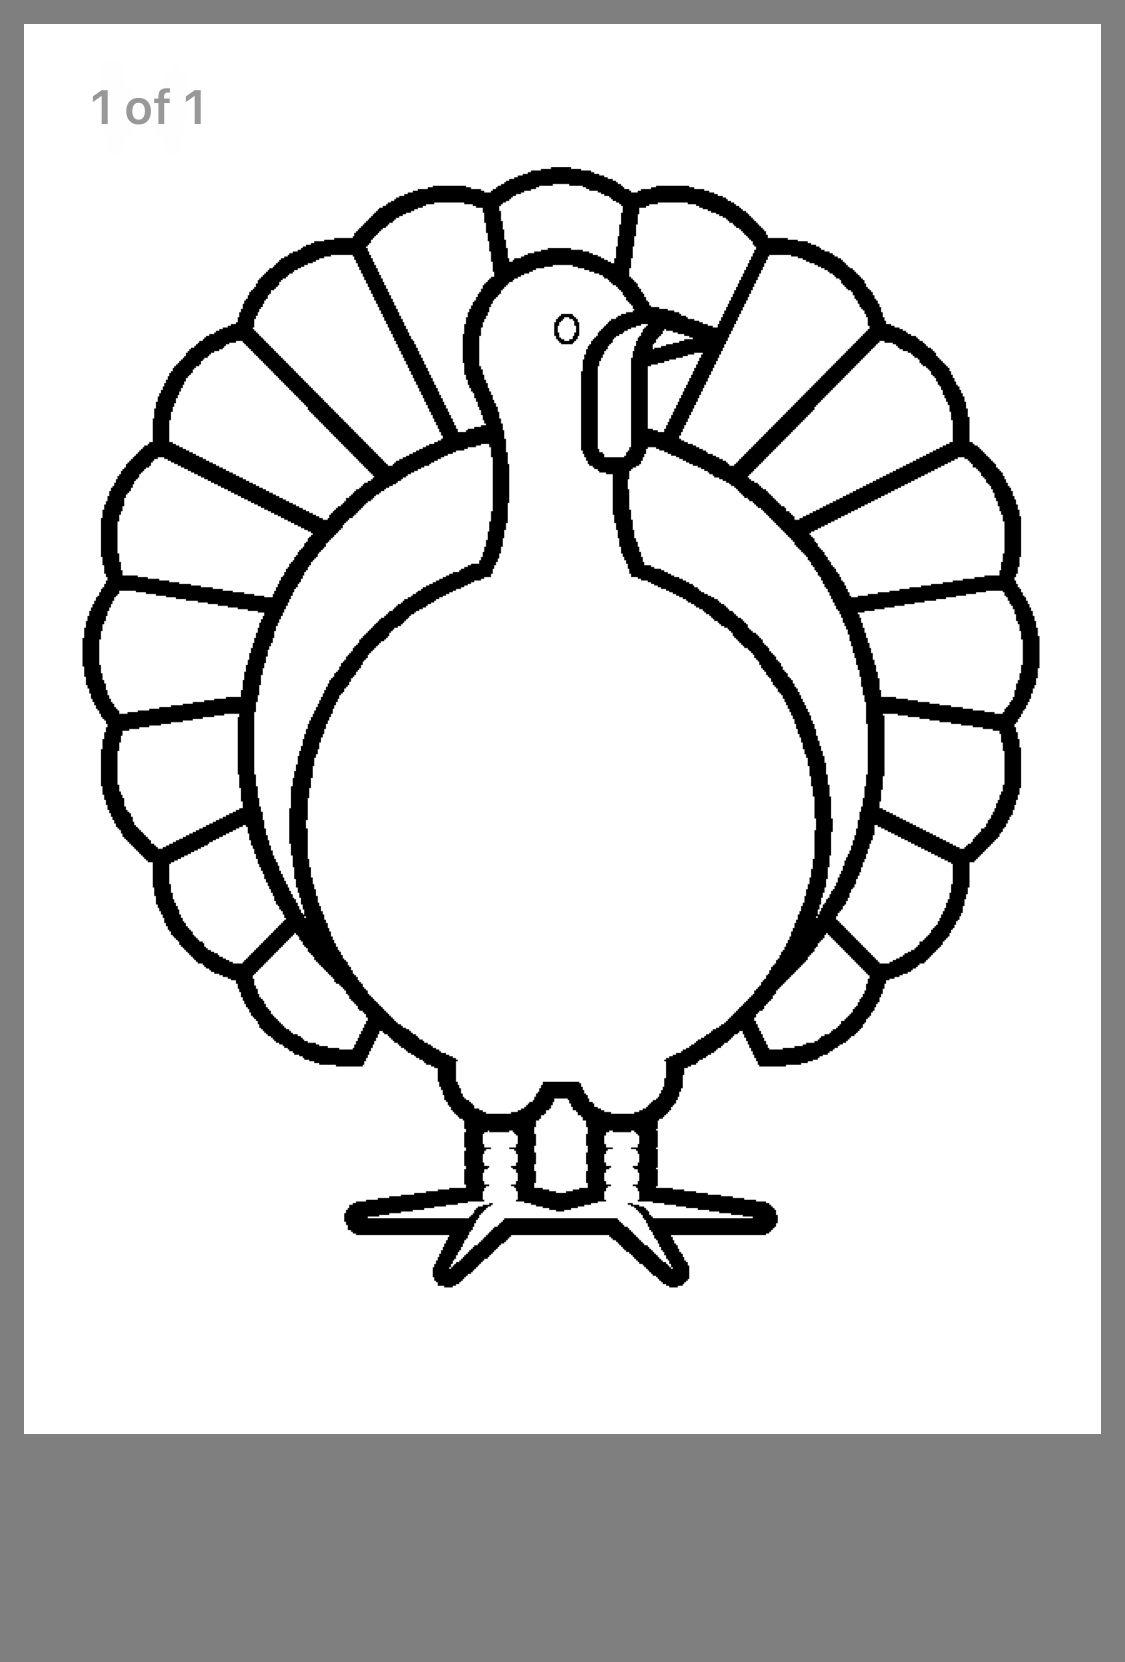 Pin By Pita On Ot Stuff Thanksgiving Coloring Pages Turkey Coloring Pages Thanksgiving Color